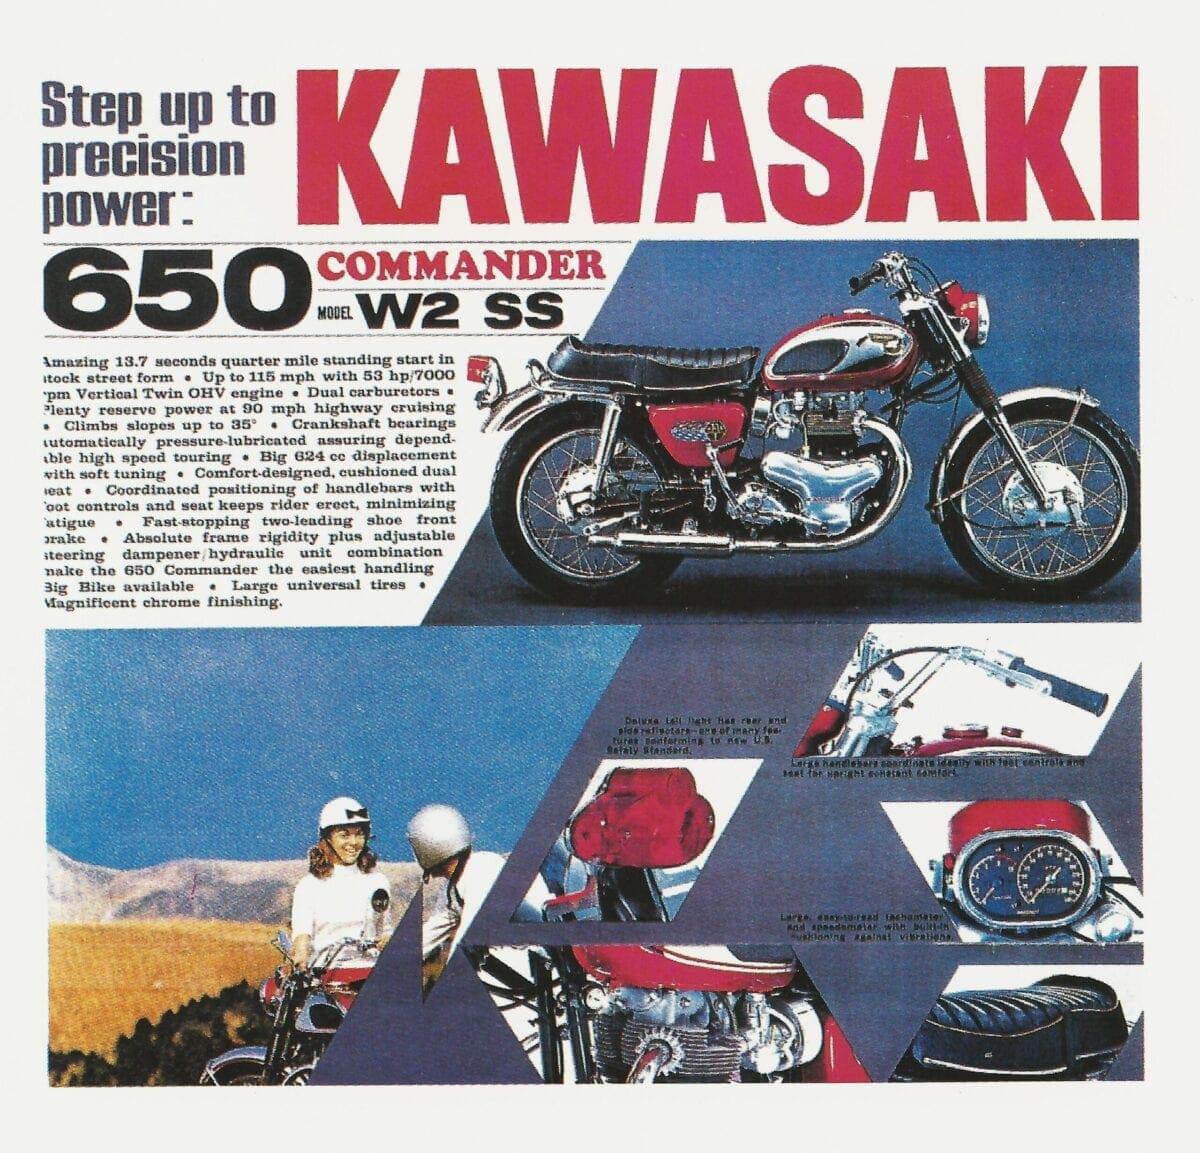 kawasaki-w2-advertisement